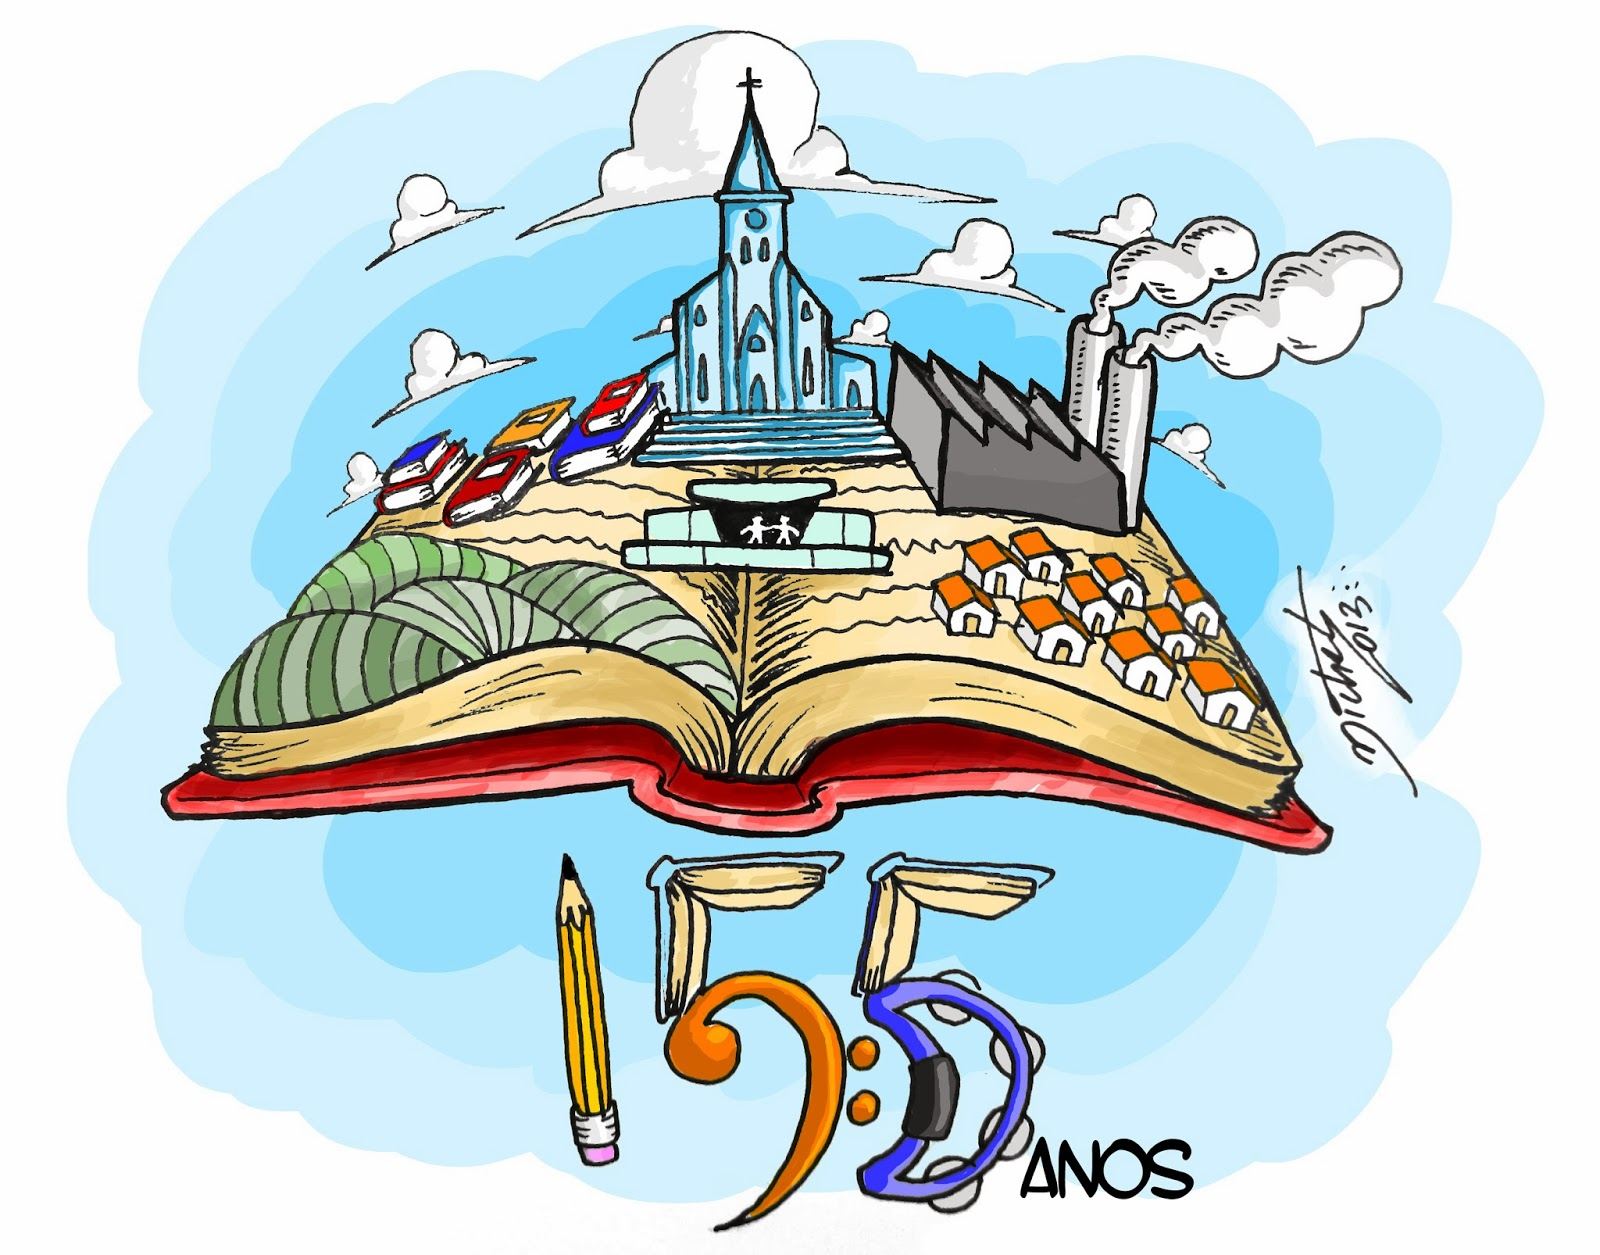 Ilustração 155º aniversário de Lençóis Paulista - Michel Ramalho